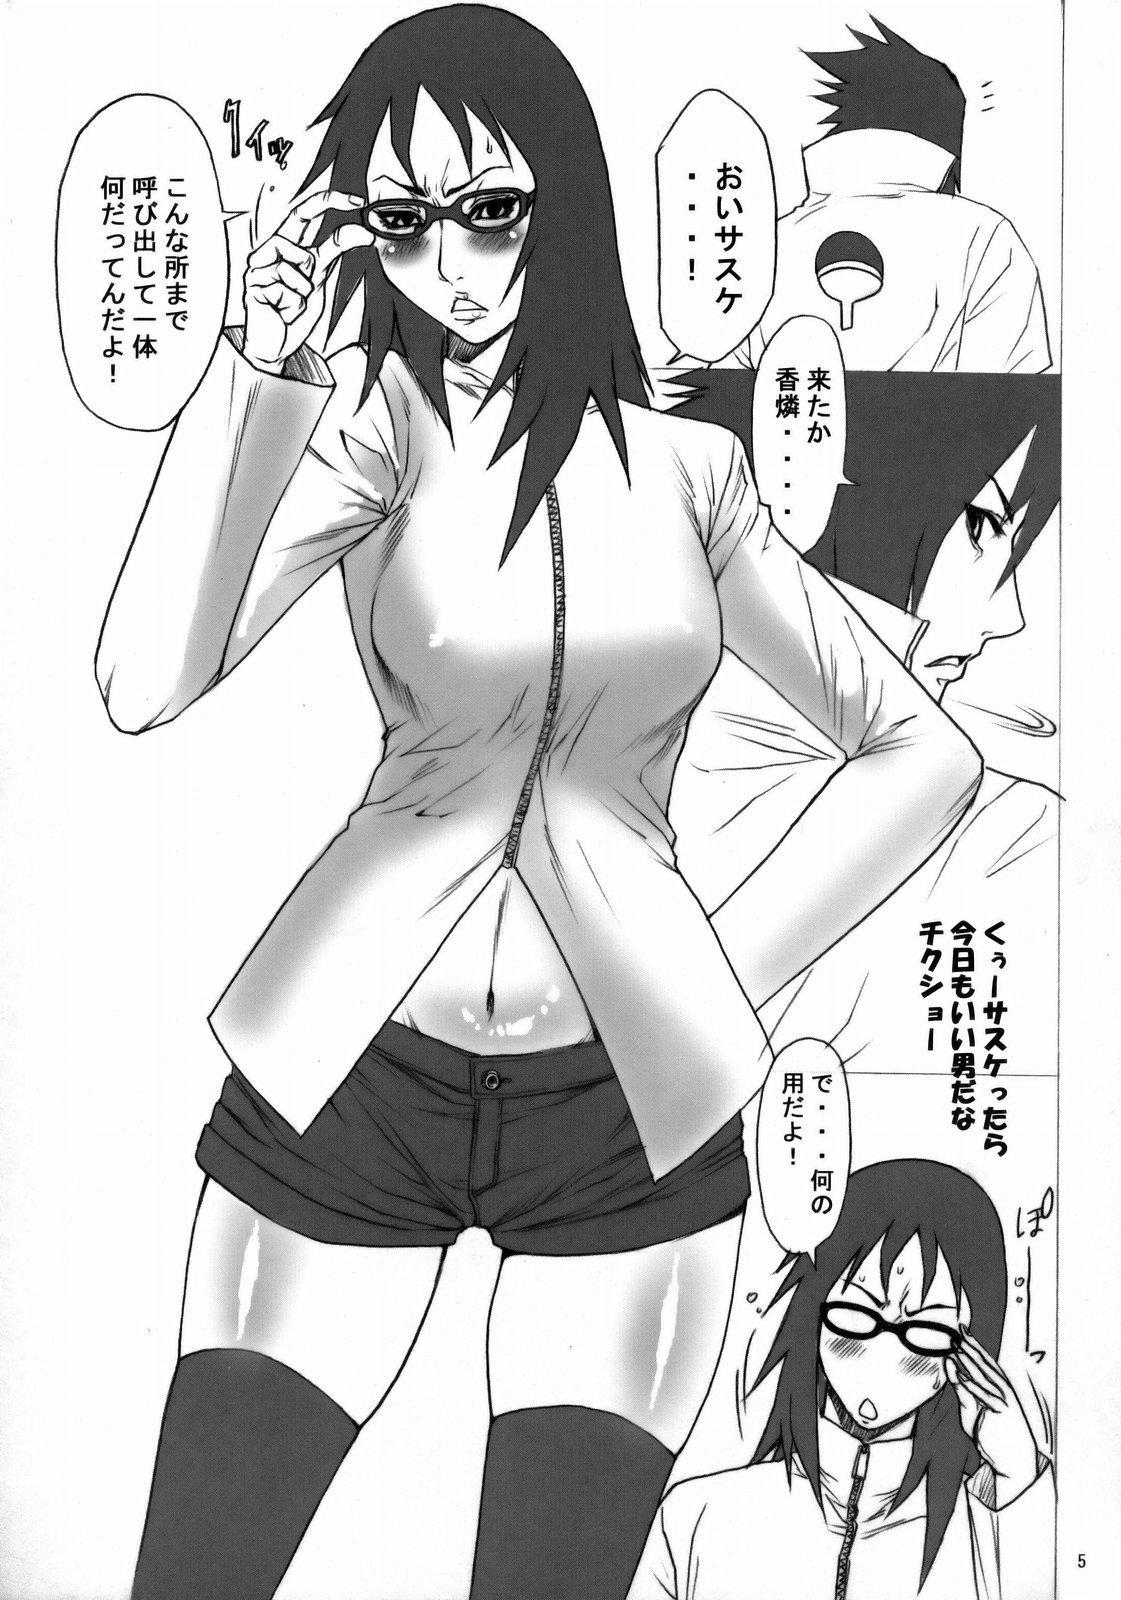 NINJA EXTREME 3 Onna Goroshi Shippuuden 3